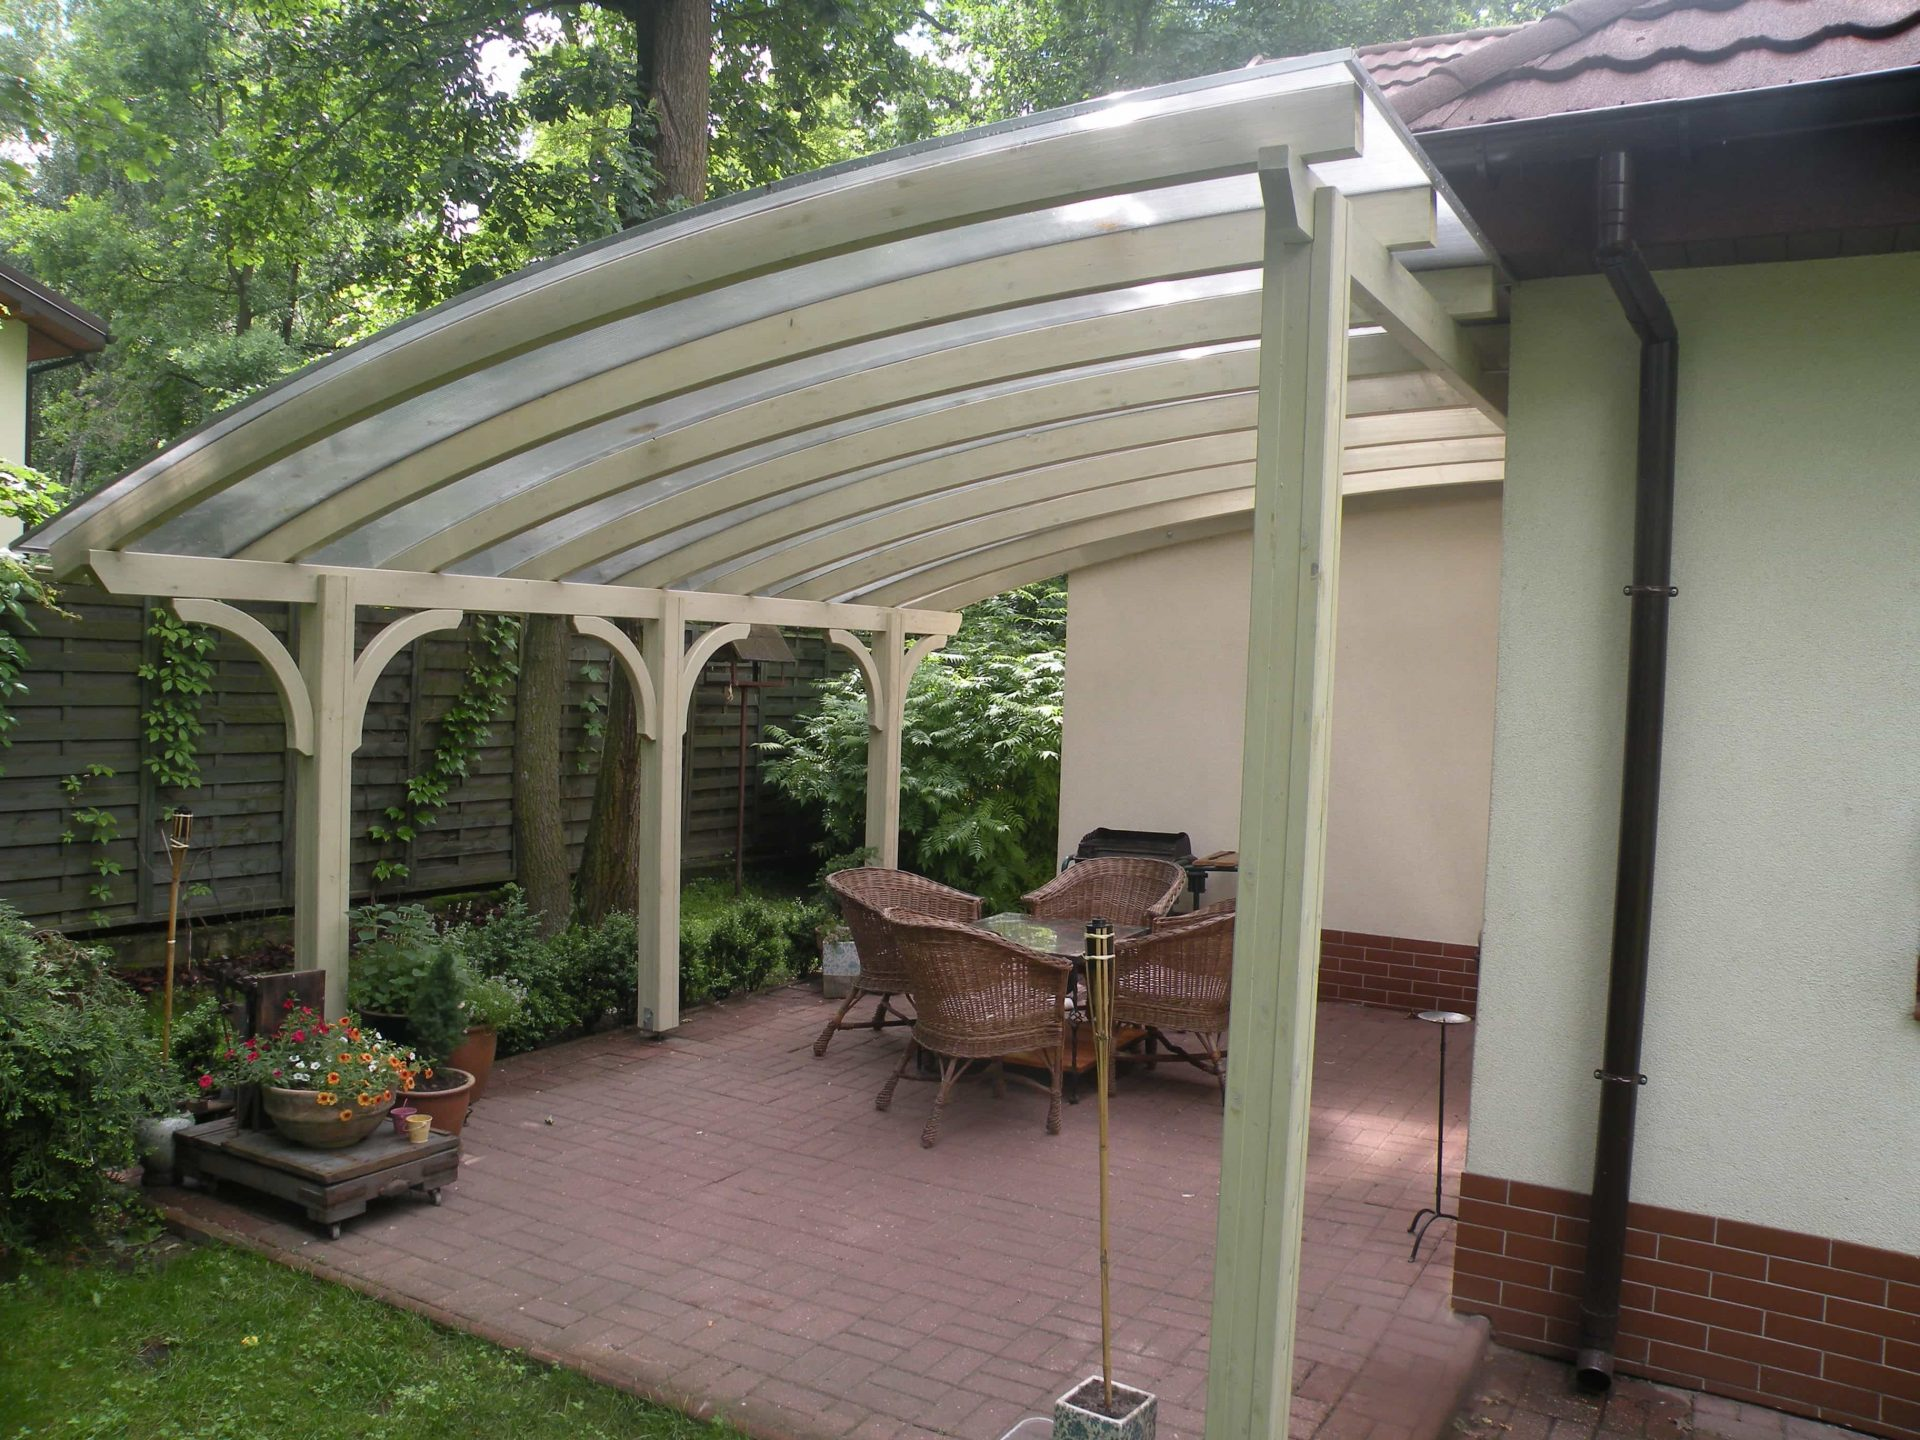 couverture de terrasse dalia jagram pro s a fr. Black Bedroom Furniture Sets. Home Design Ideas